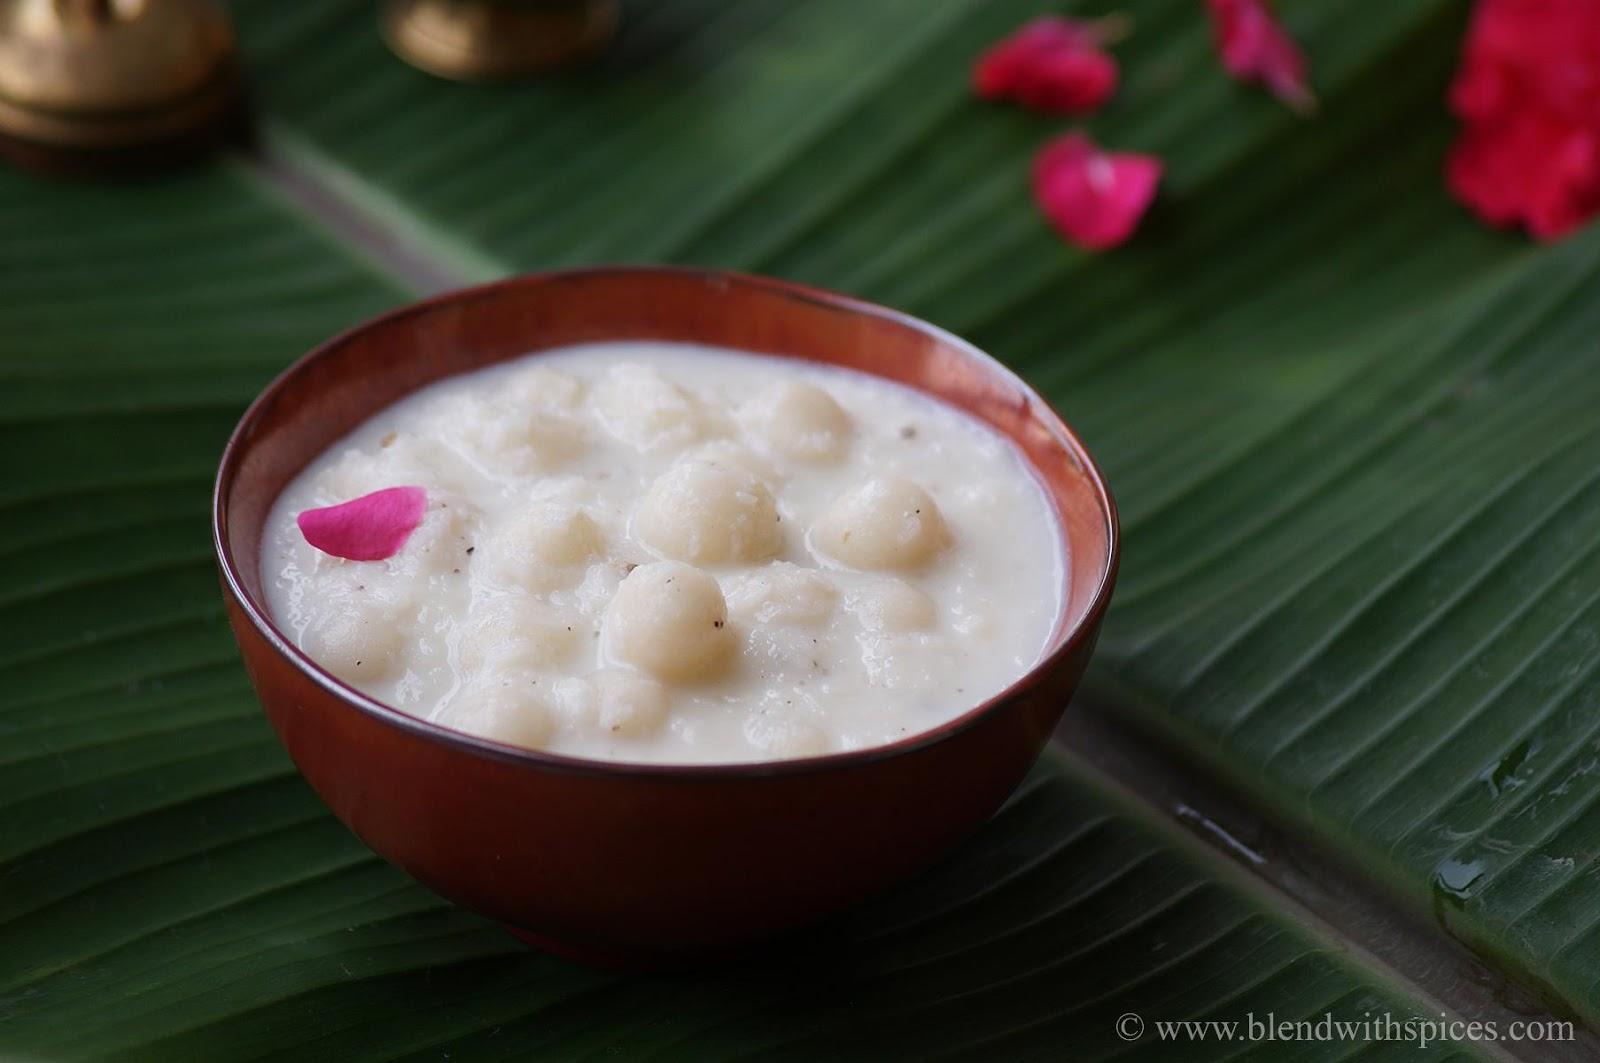 how to make undralla payasam with rice flour, step by step recipe with video, vinayaka chavithi prasadam